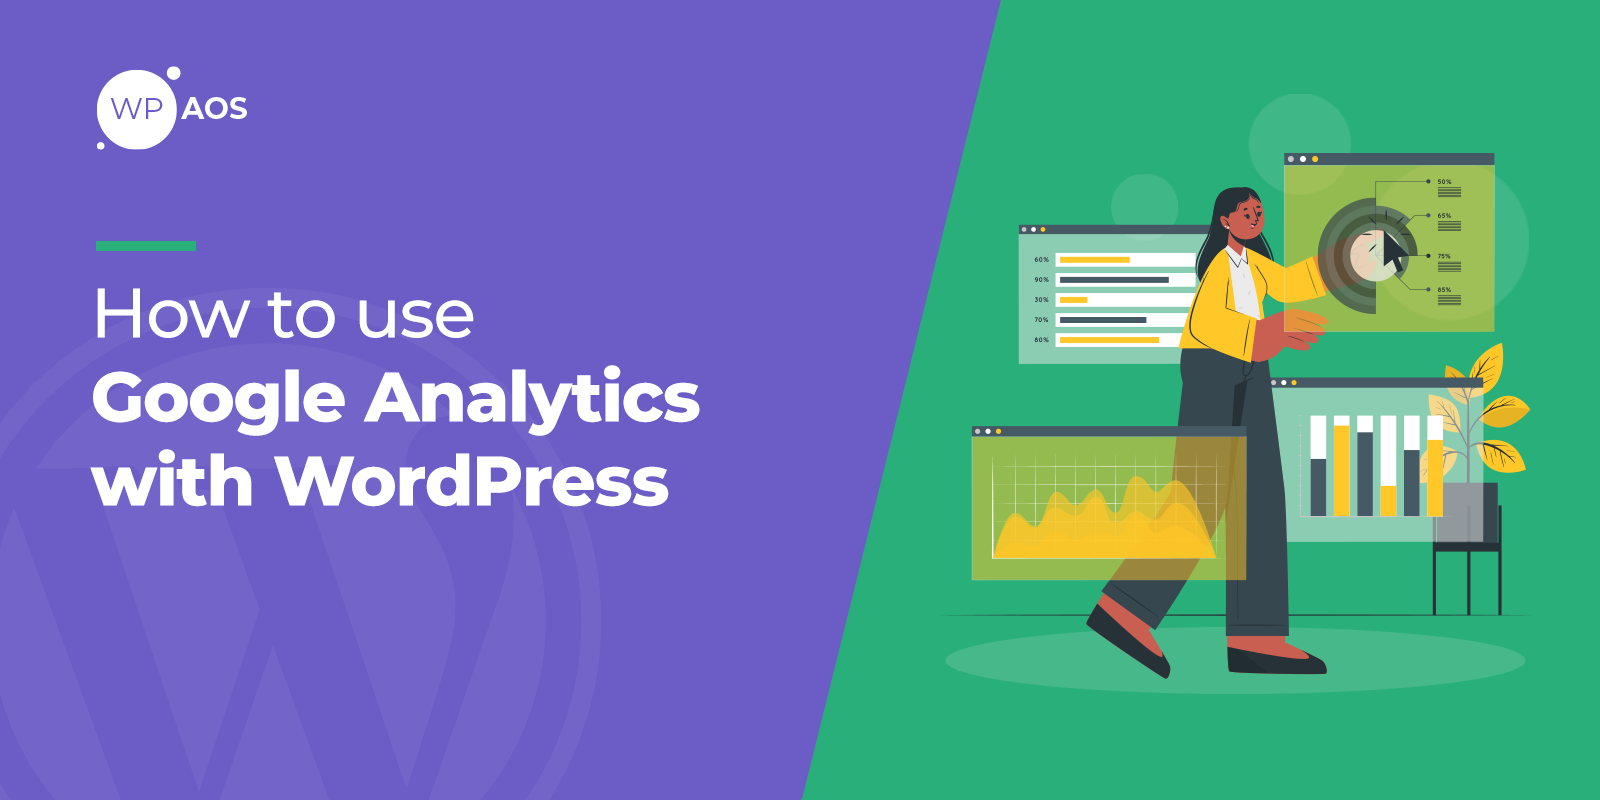 how-to-use-google-analytics-with-wordpress